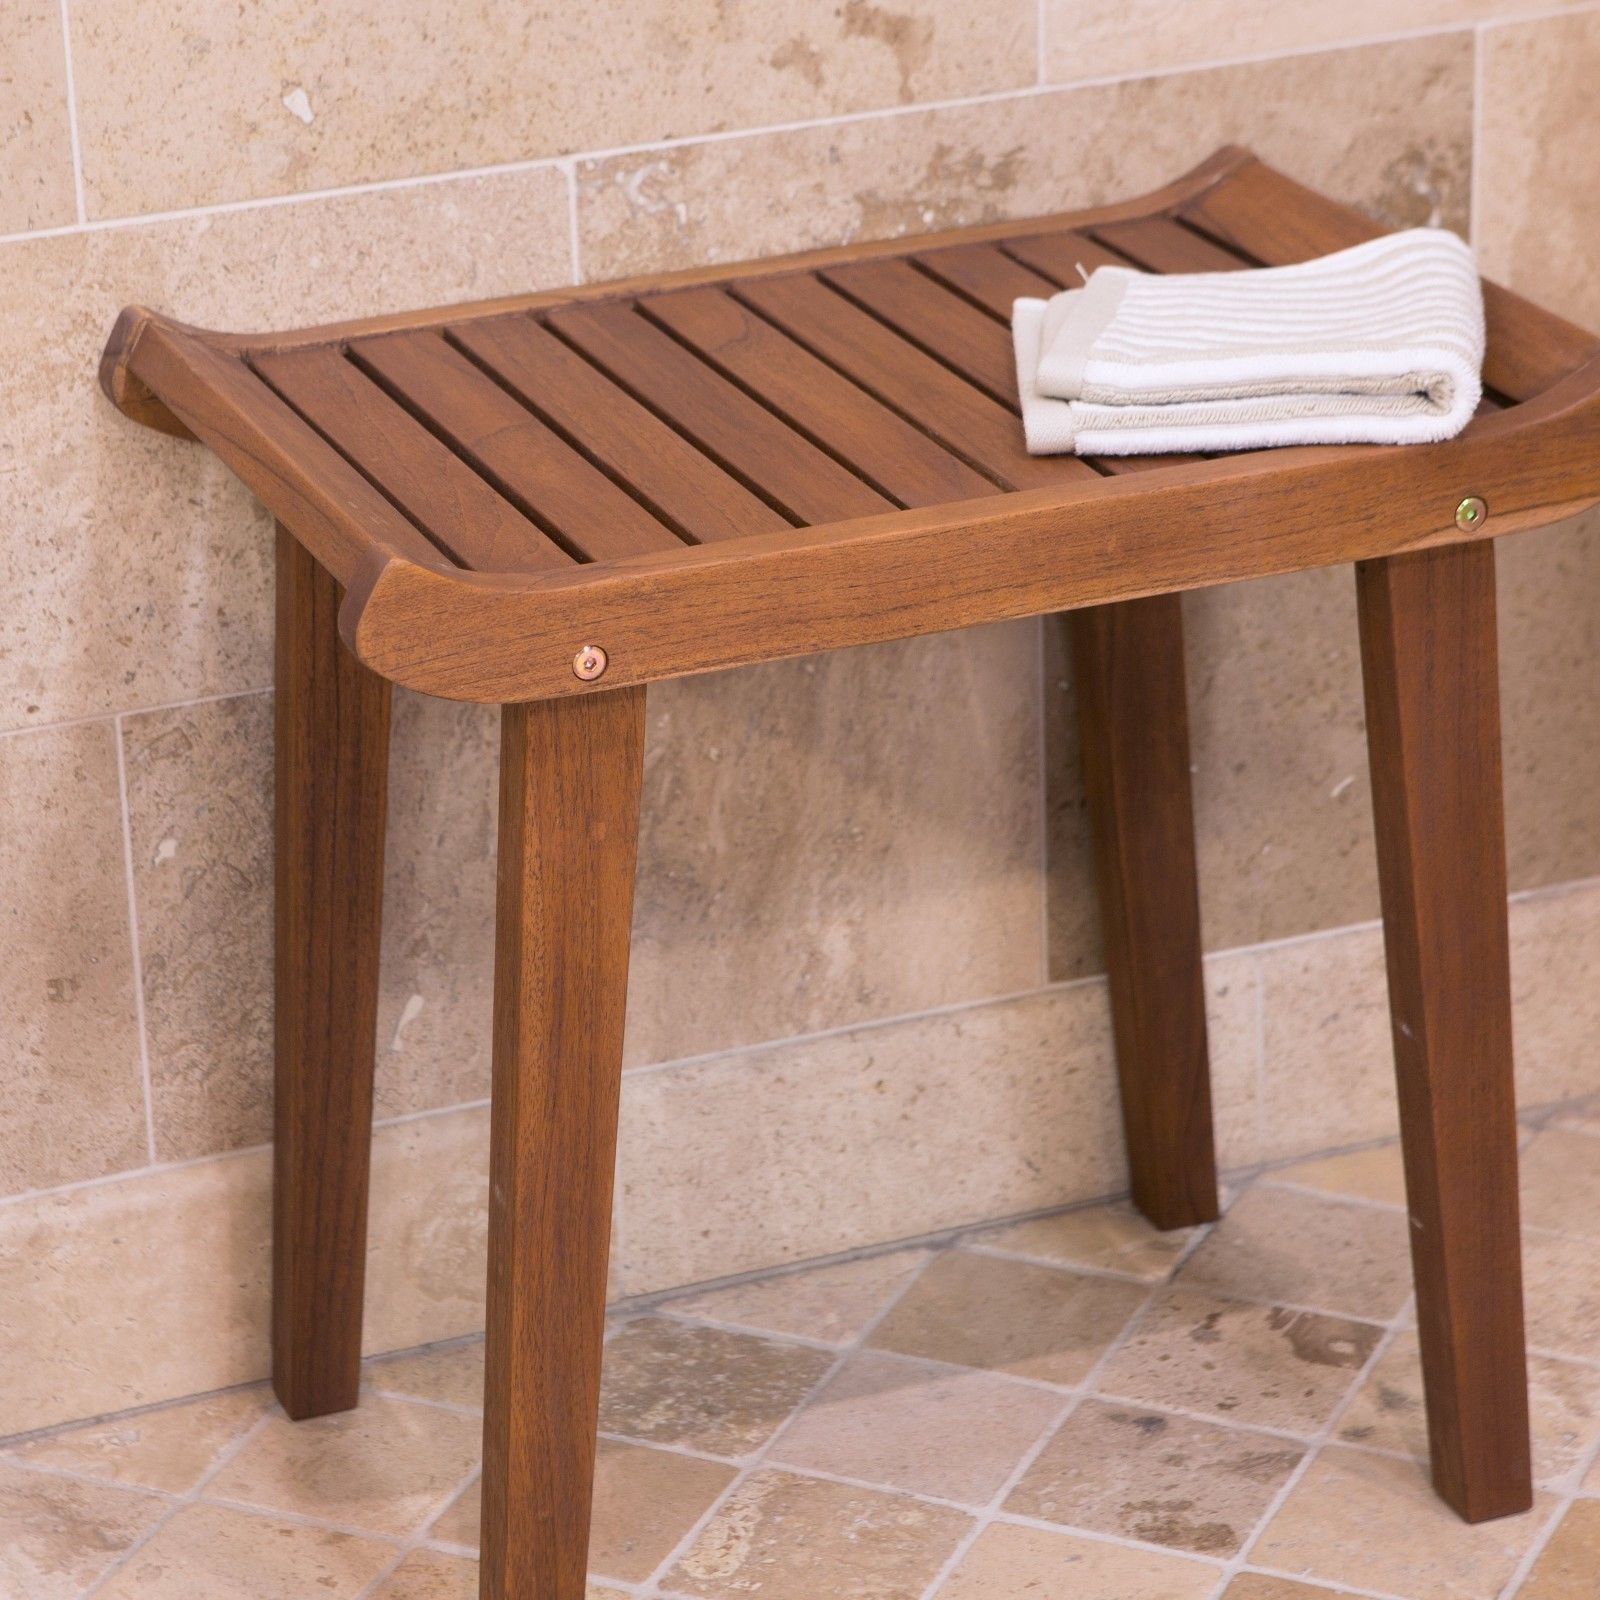 Premium Solid Teak Wood Slatted Shower Bench Bathroom Seat ...